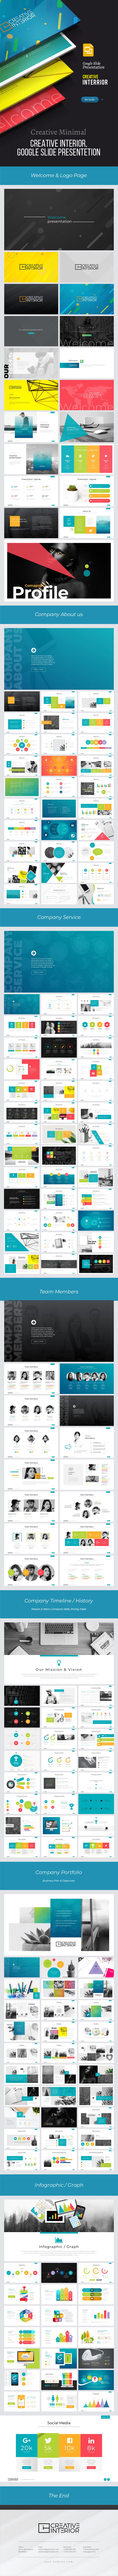 Creative Interior | Google Slide Template - Google Slides Presentation Templates